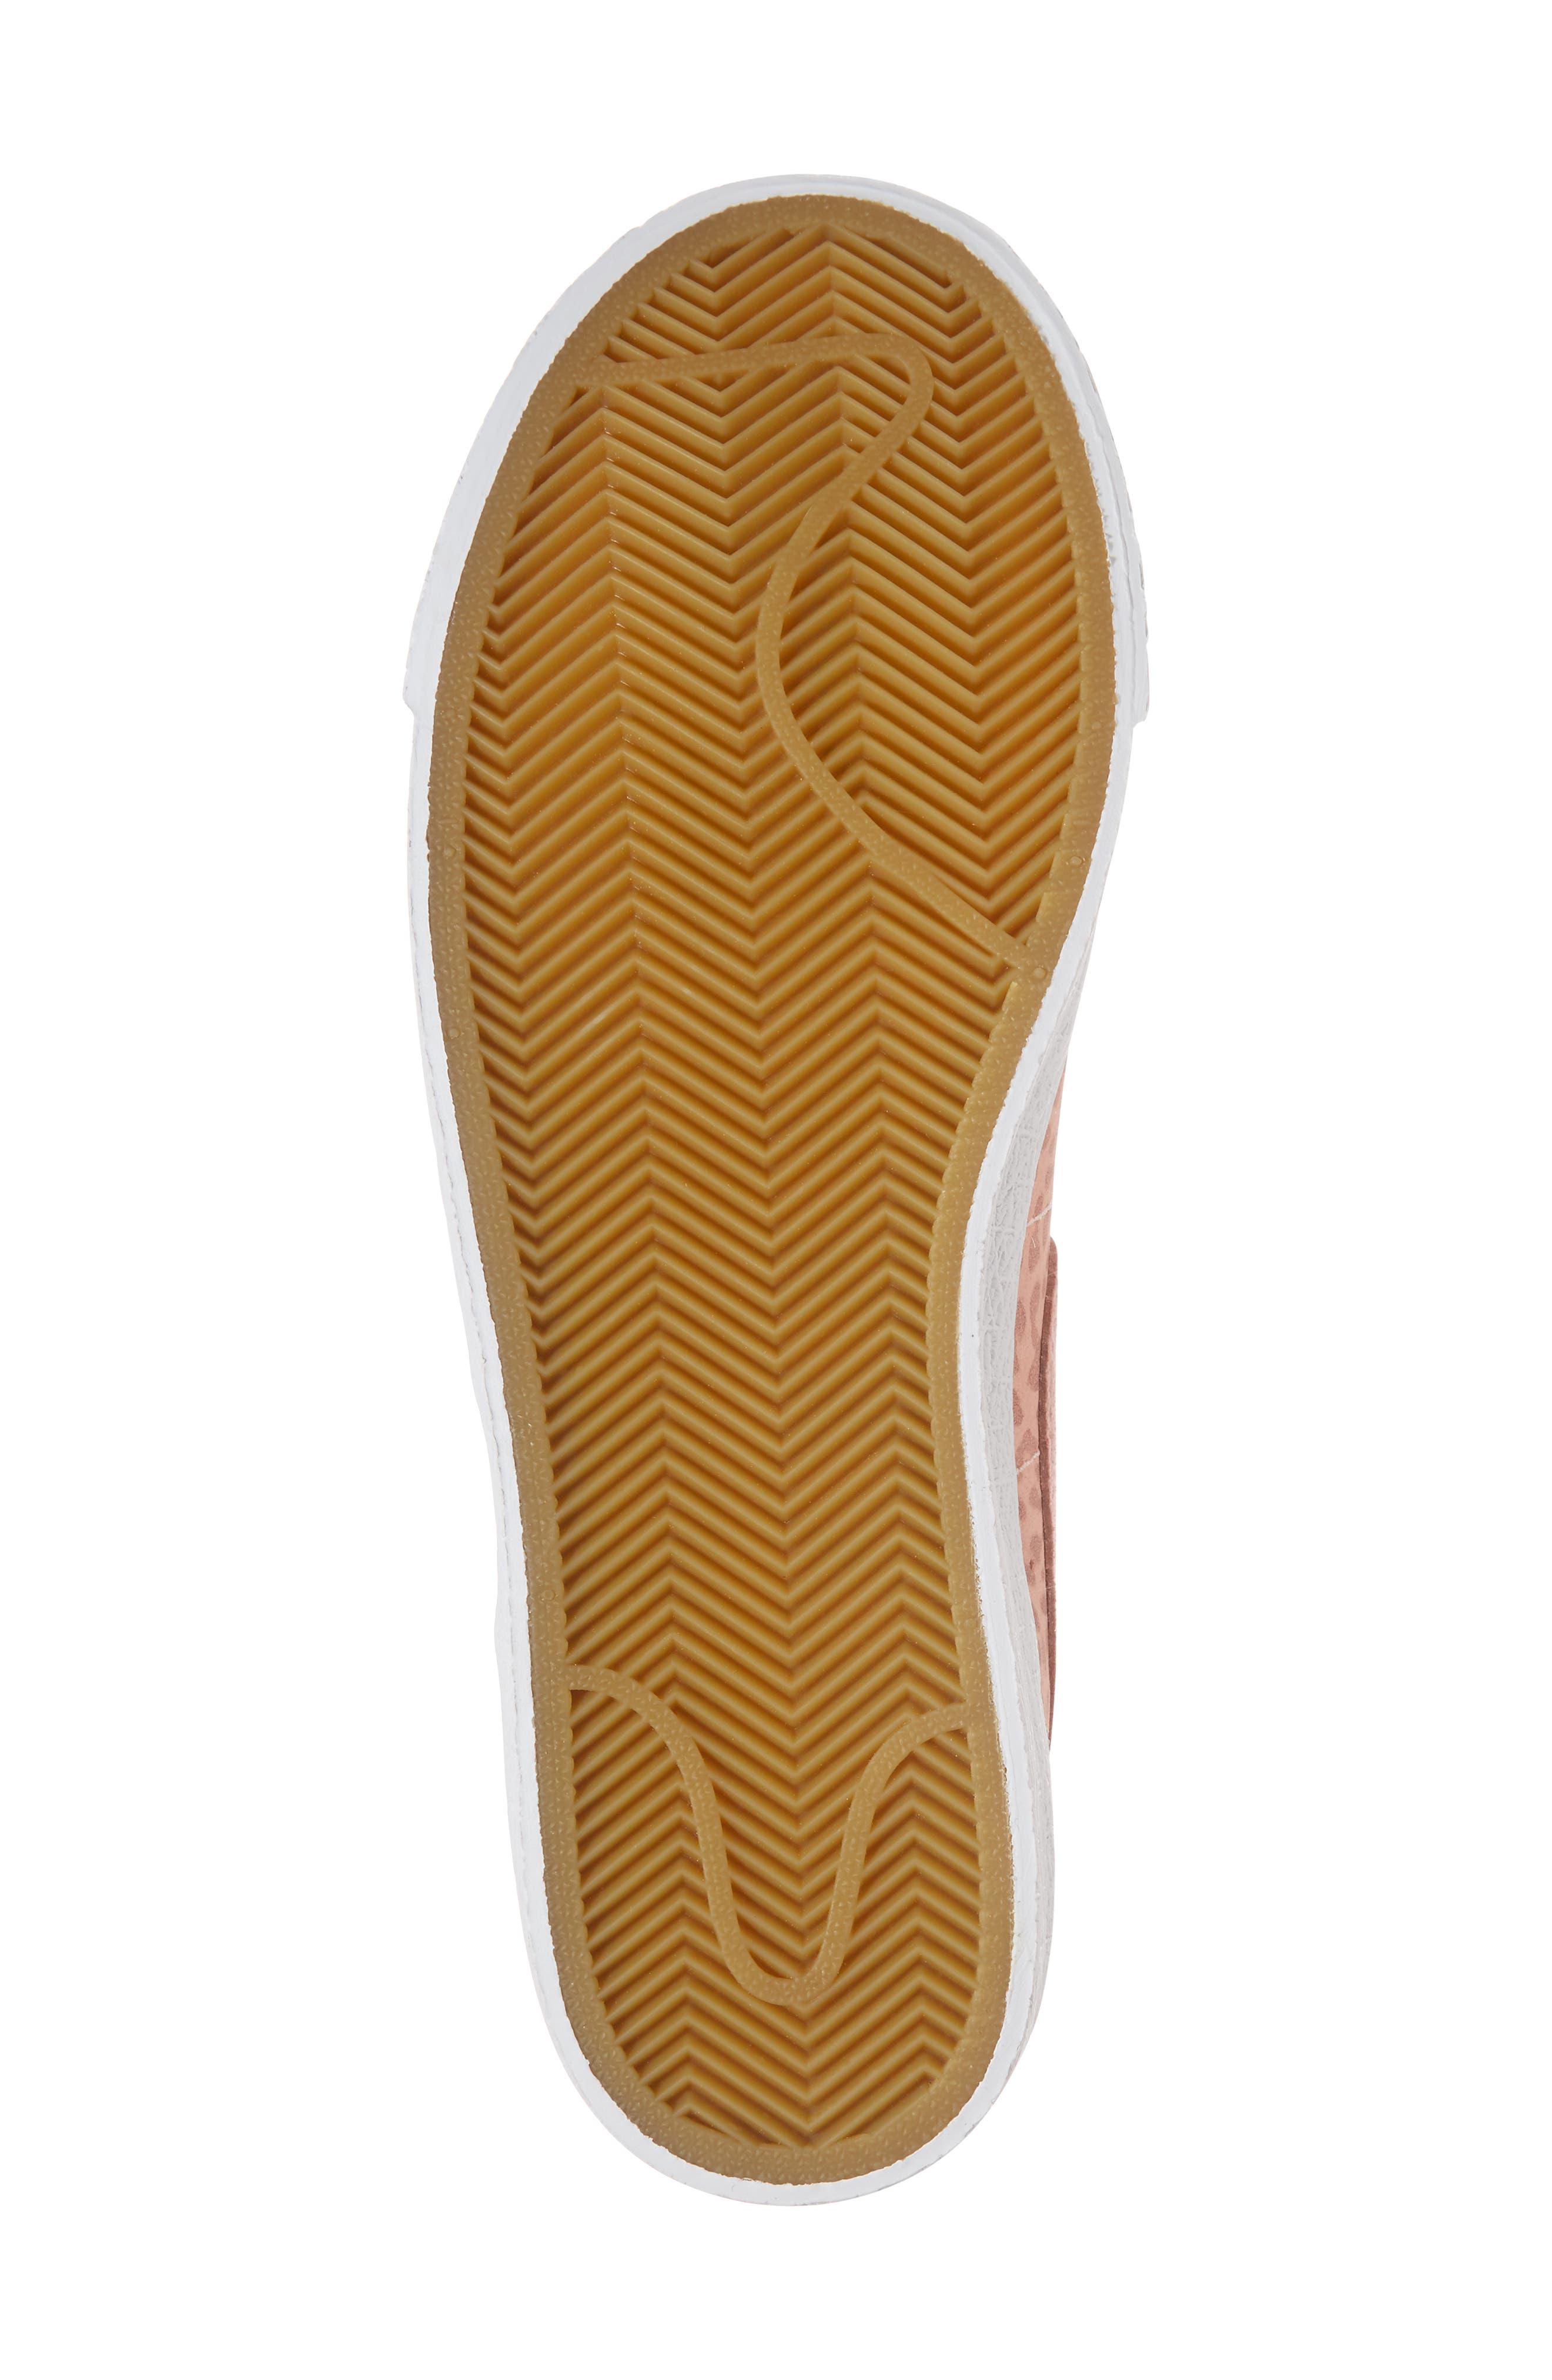 Blazer Mid SE High Top Sneaker,                             Alternate thumbnail 17, color,